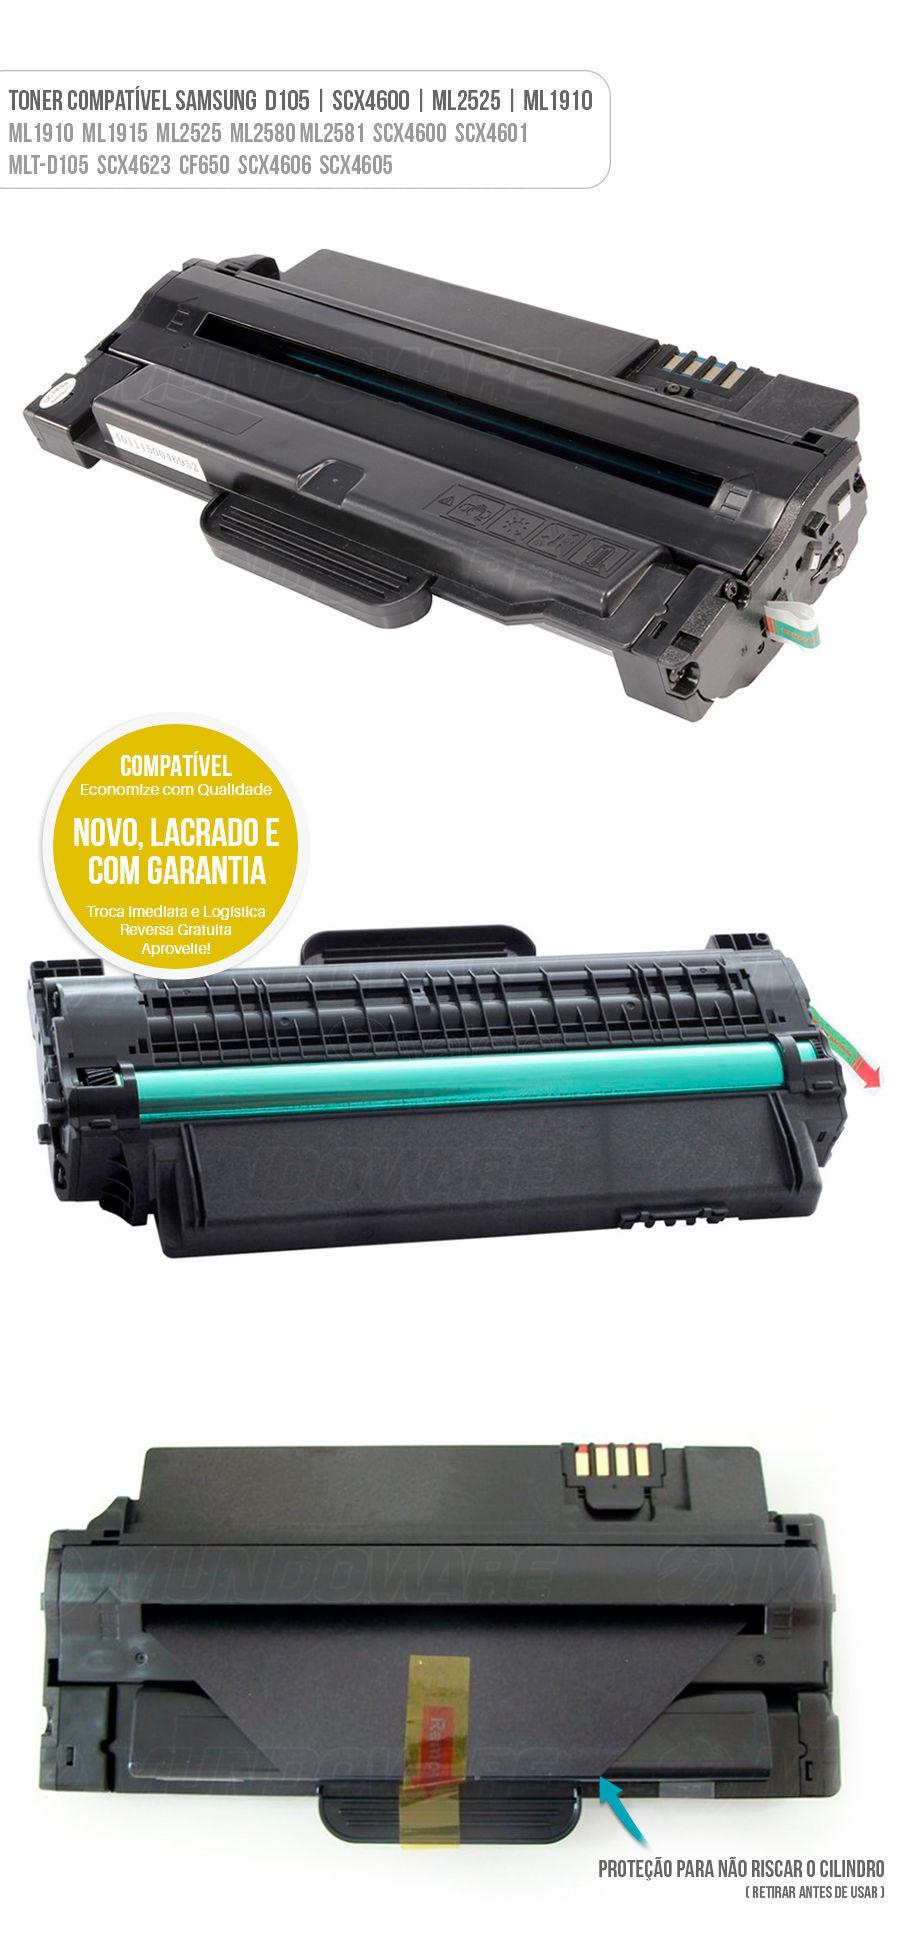 Samsung SCX4600 D105 S1053L MLTD105S S1053 D105S D105L 105L 105S Tonner